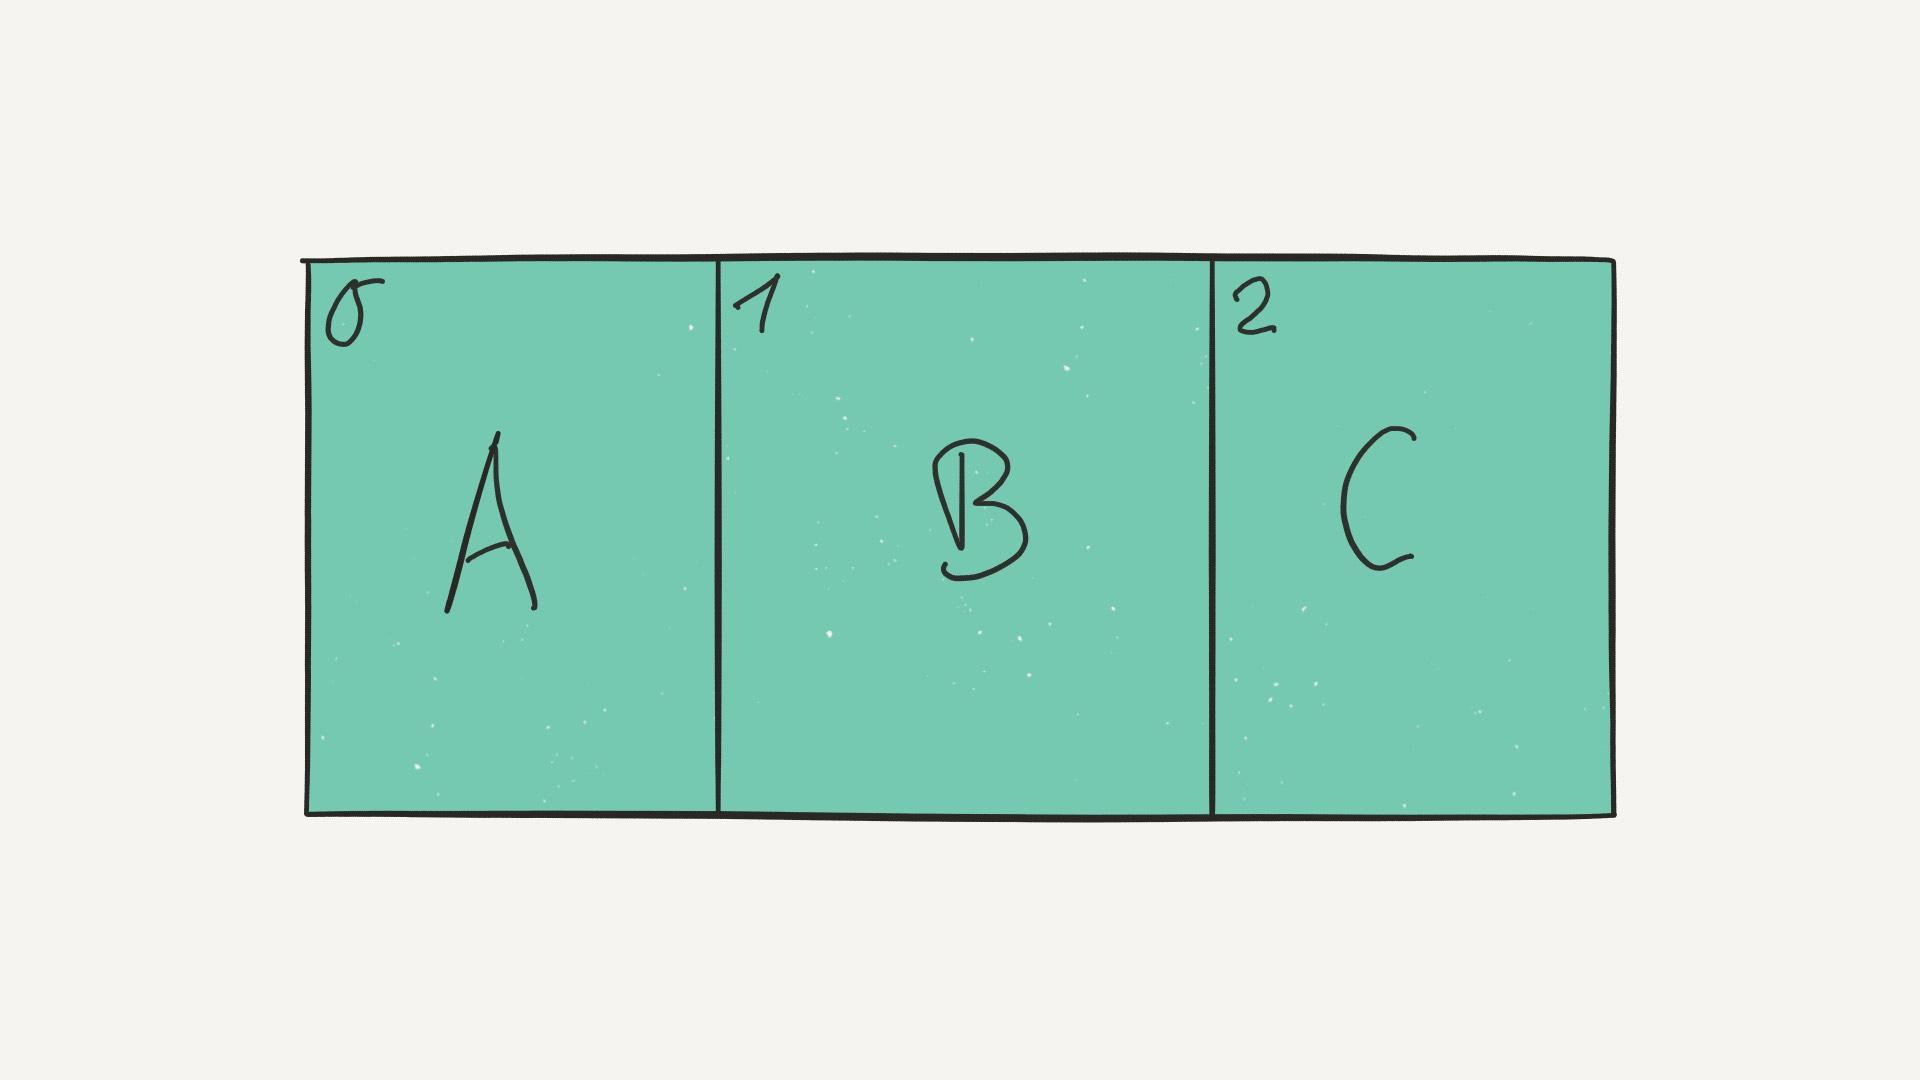 Array Visualization